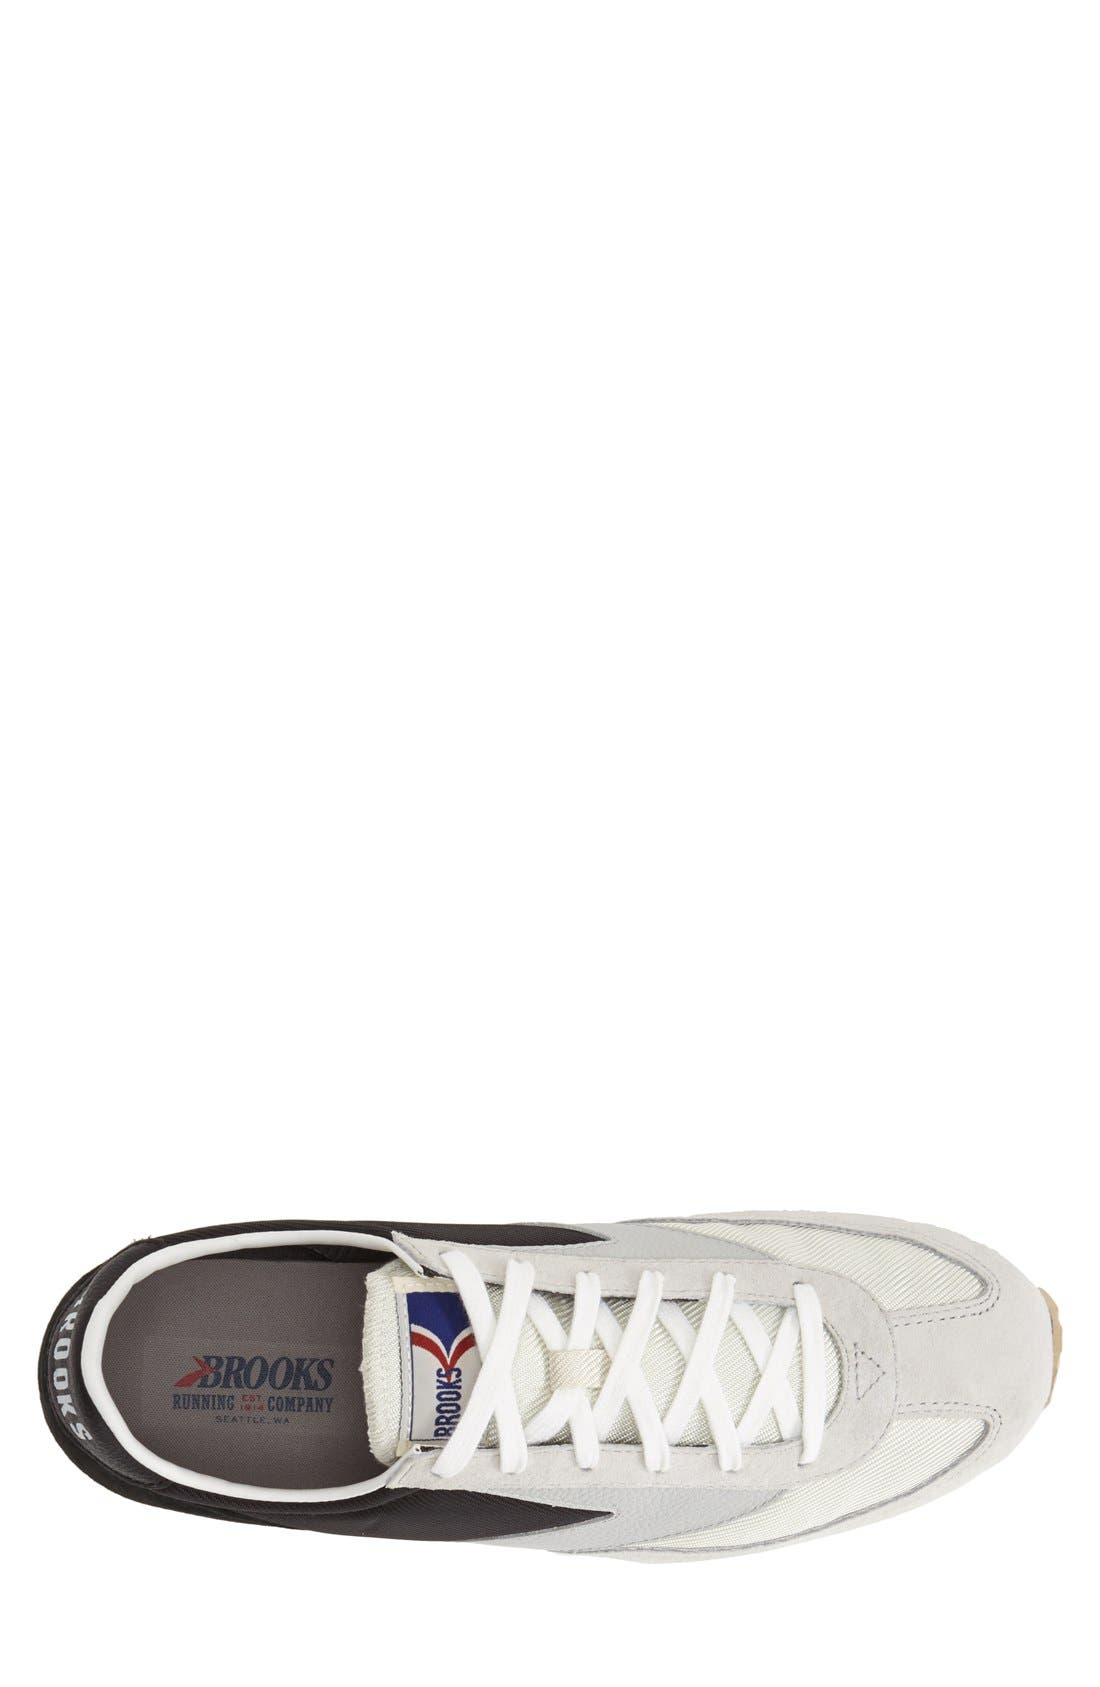 'Vanguard' Sneaker,                             Alternate thumbnail 3, color,                             001